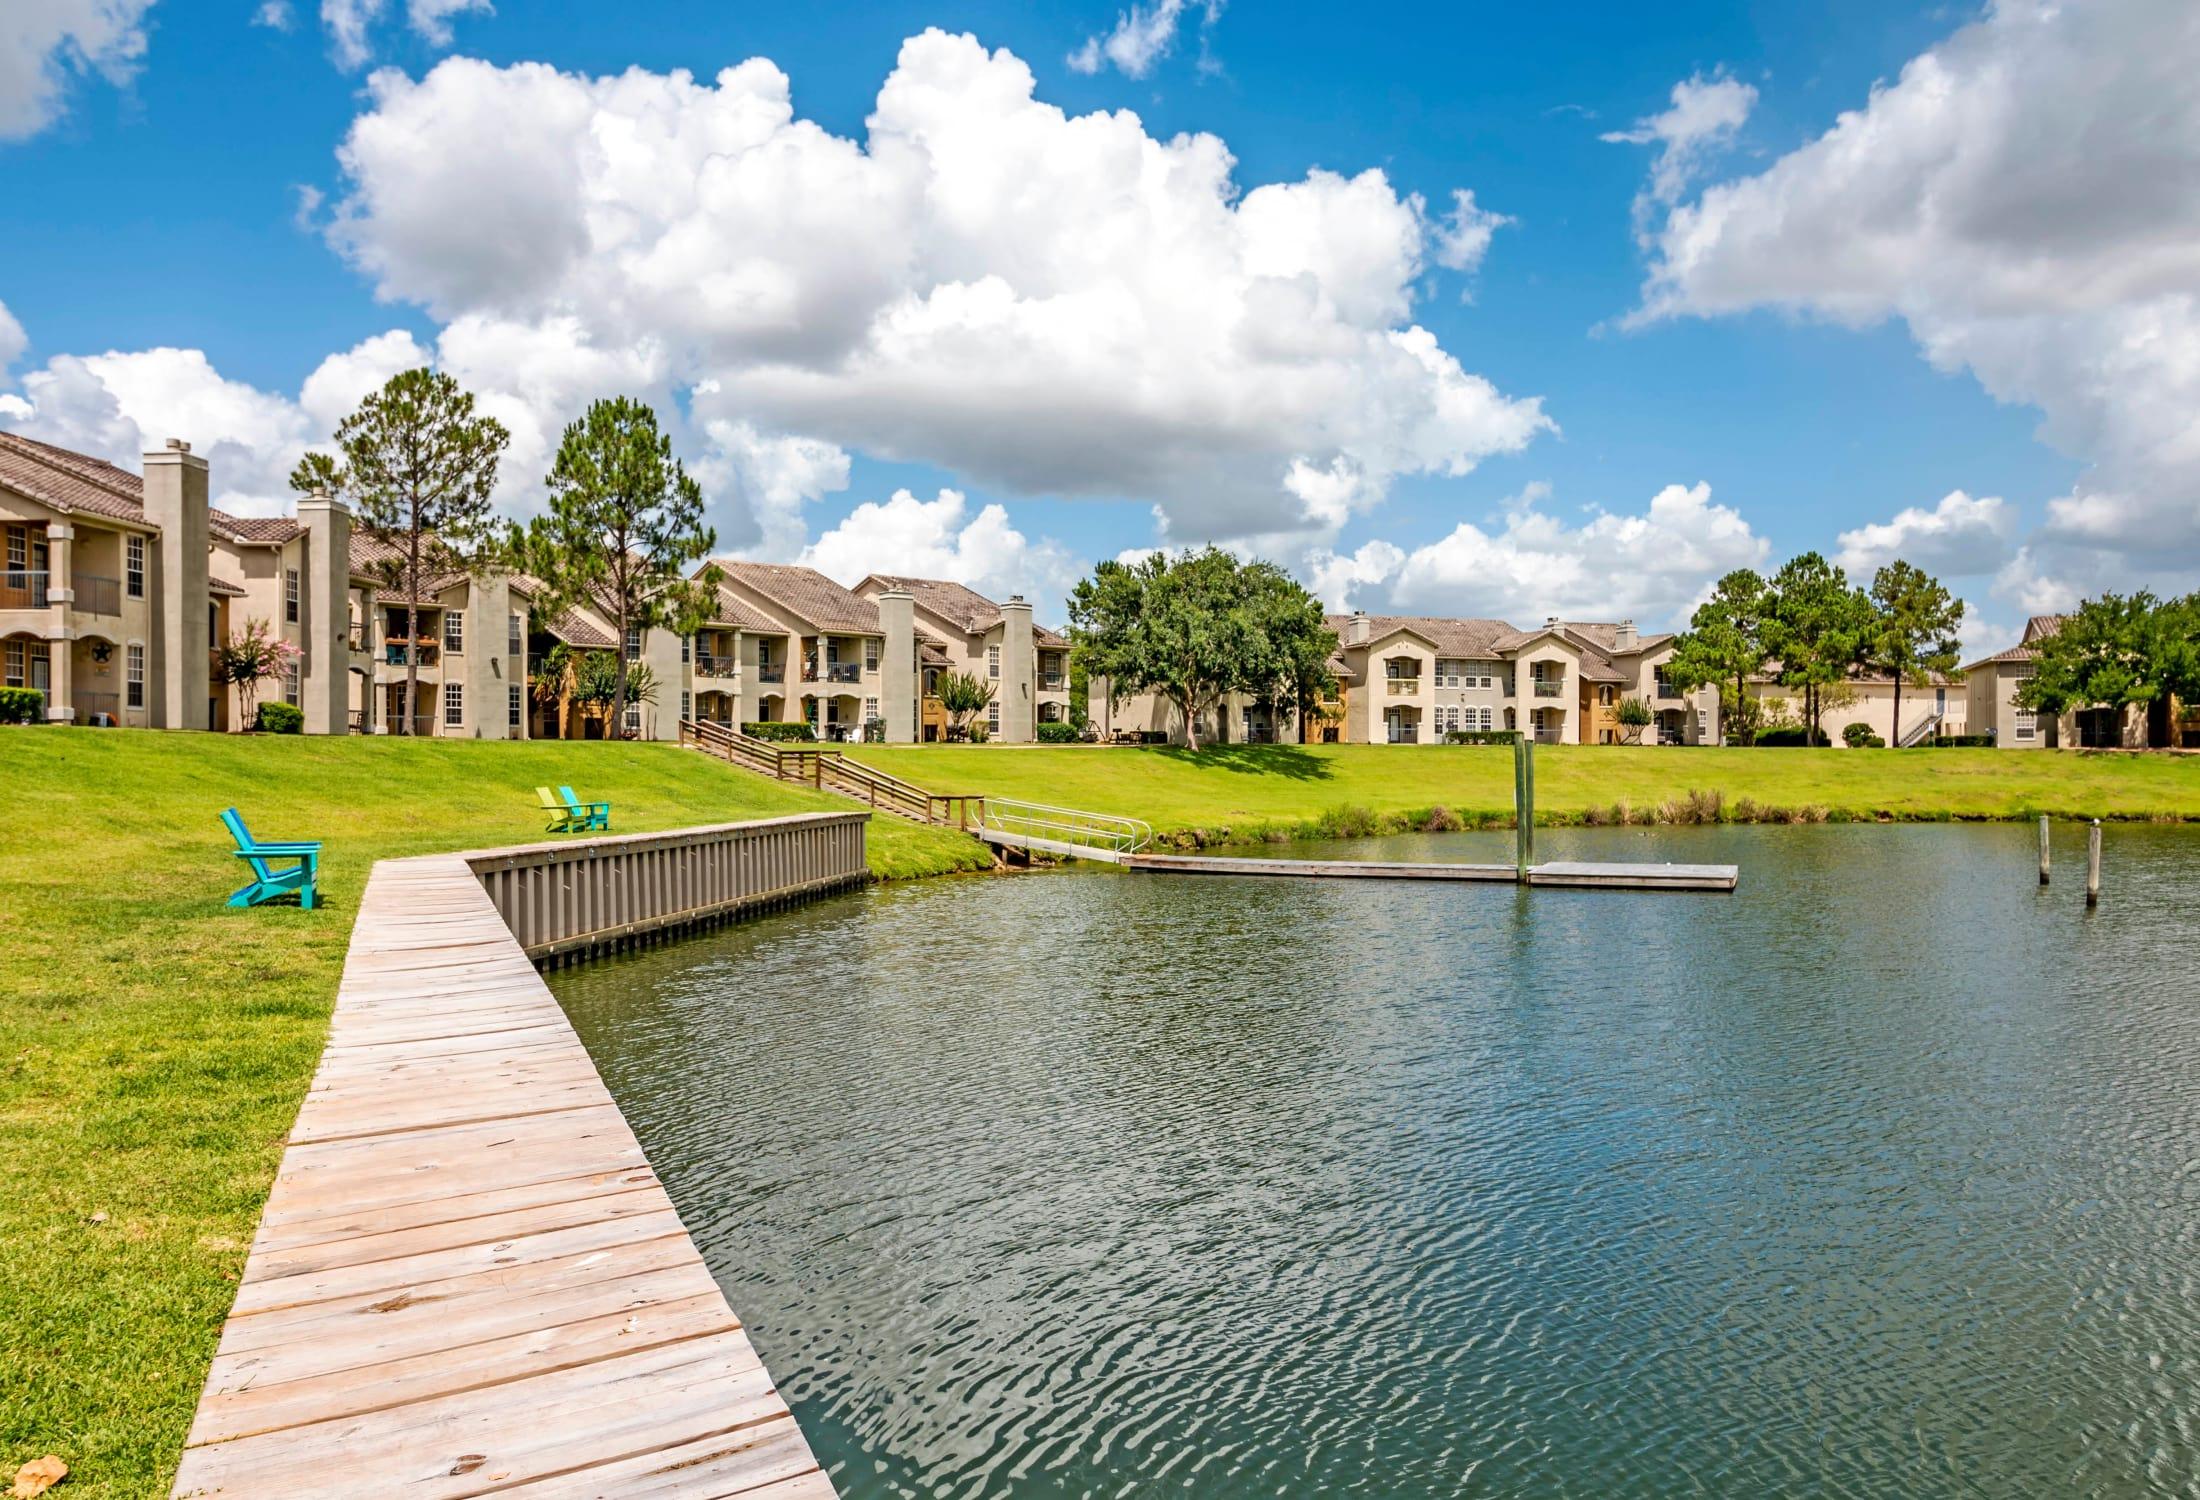 League City Tx Apartments For Rent Signature Point Apartments